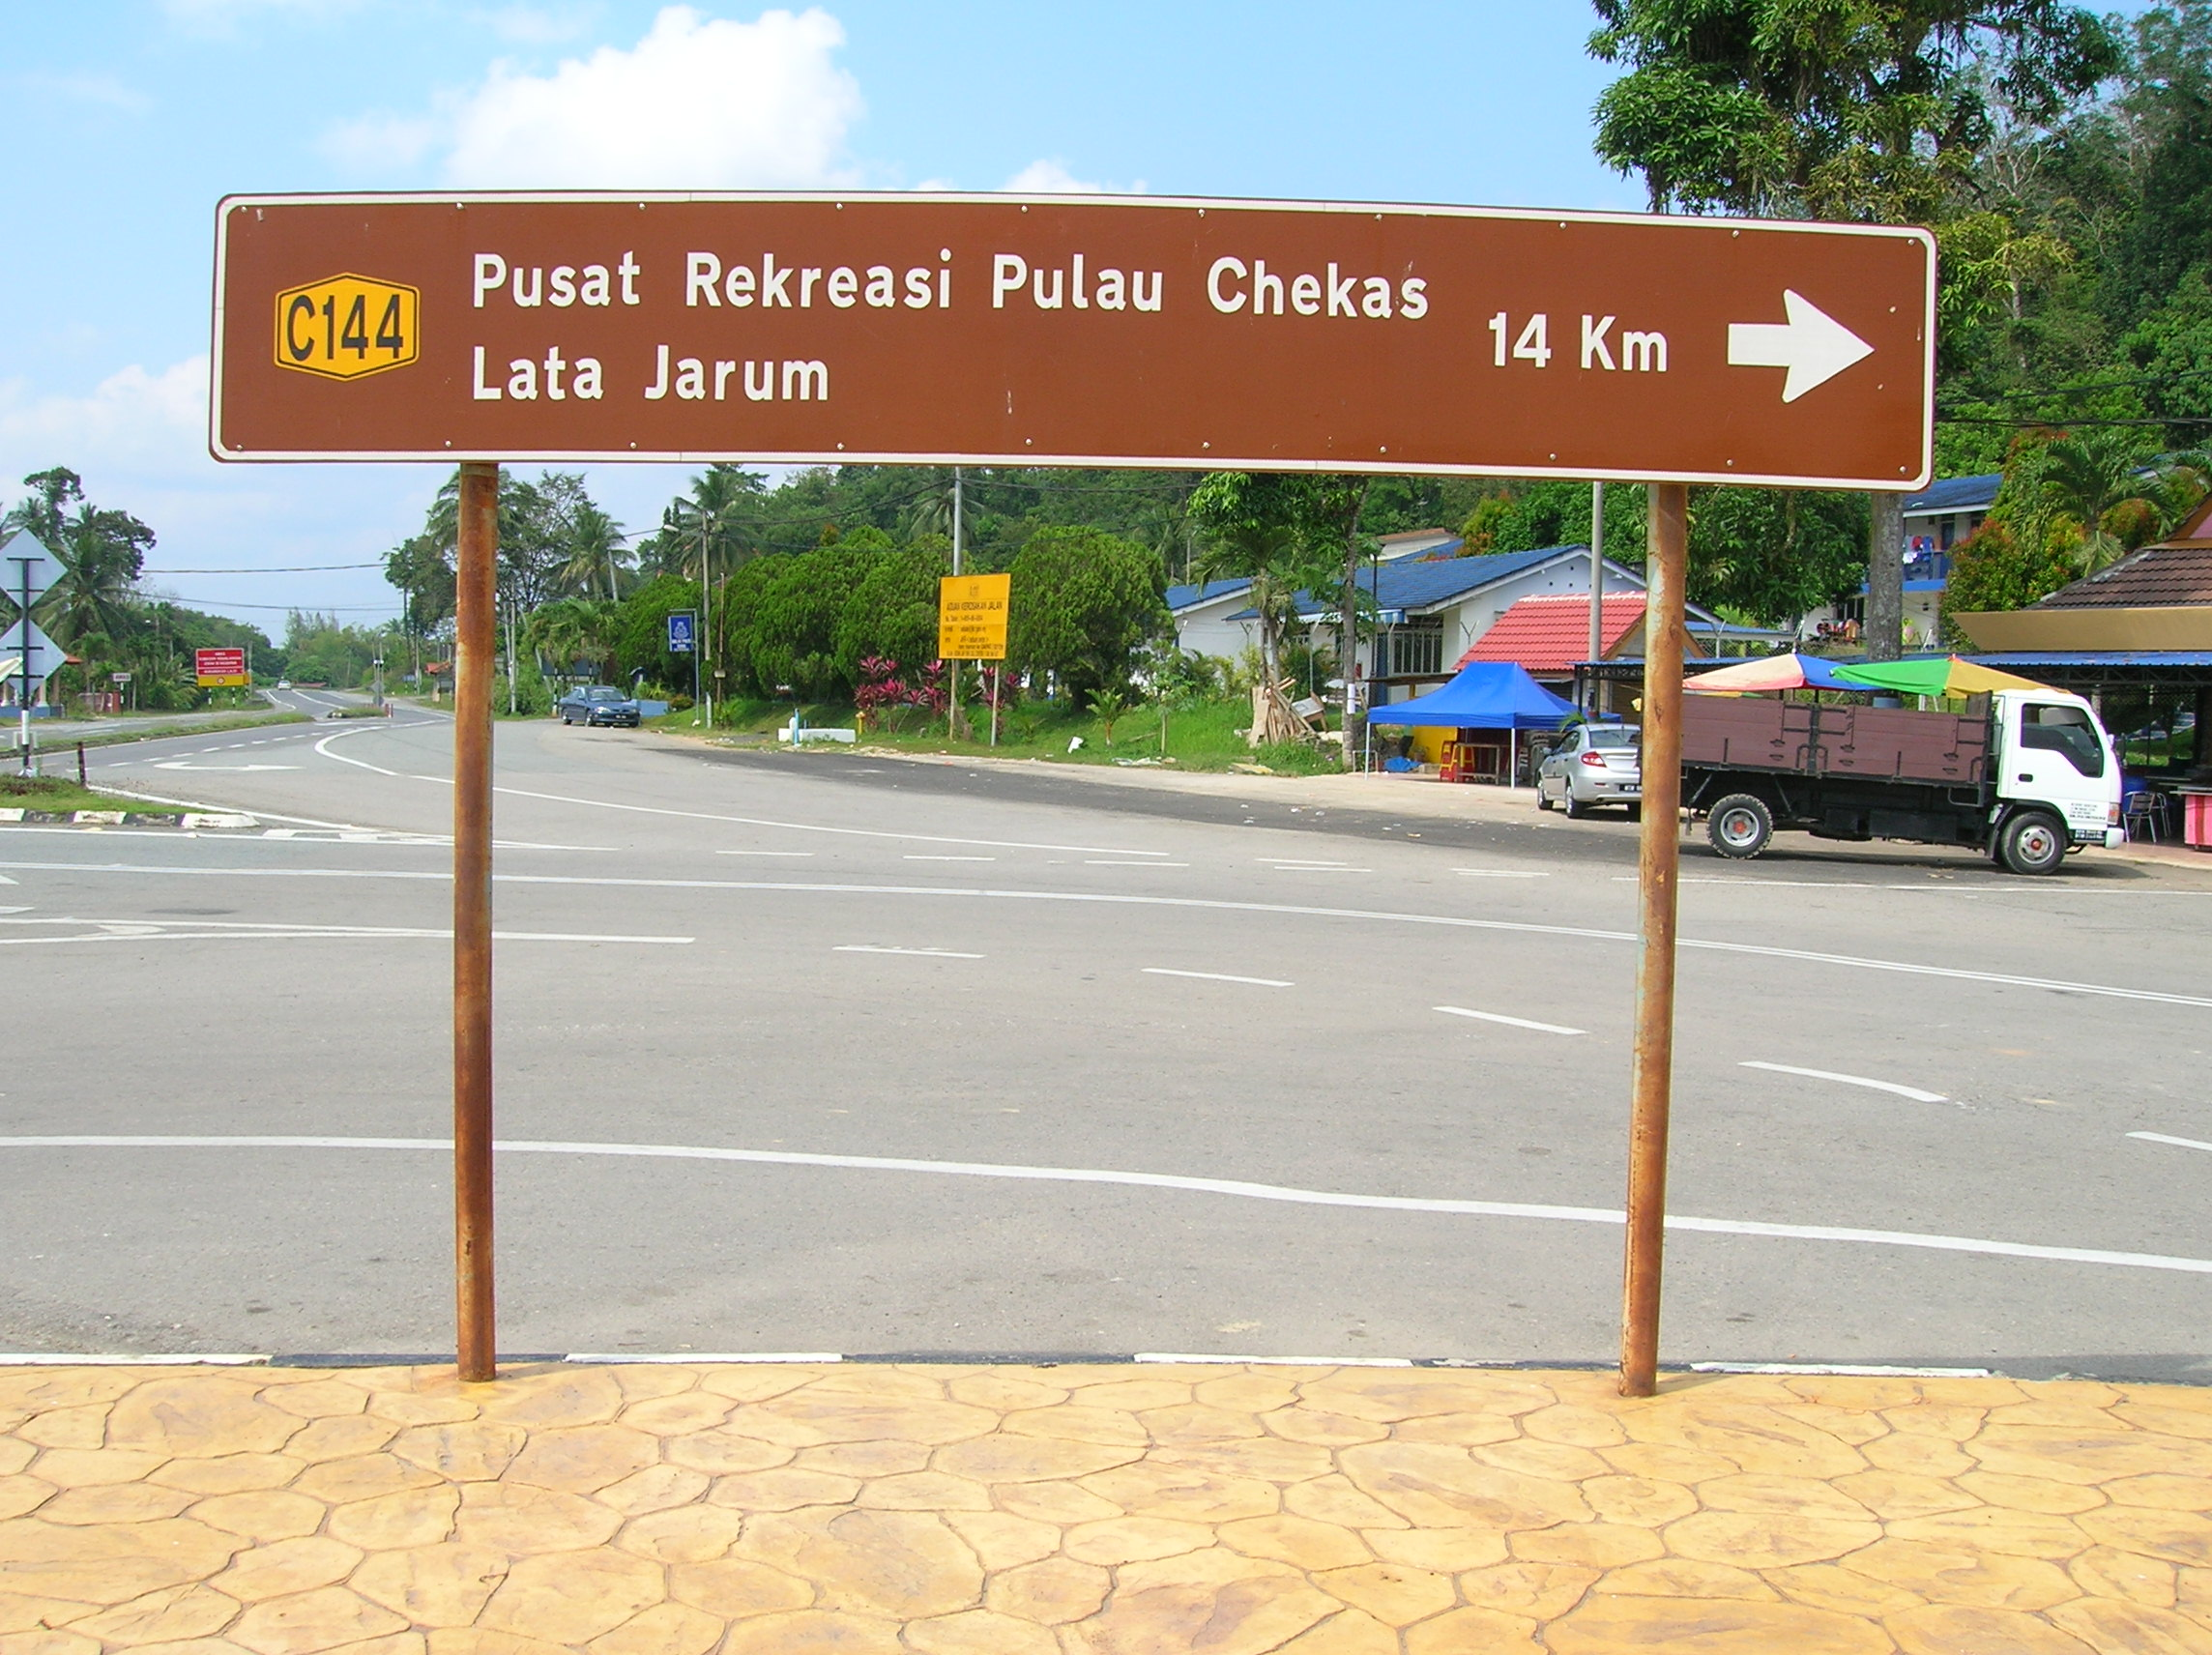 Image result for warna signboard jalan di malaysia